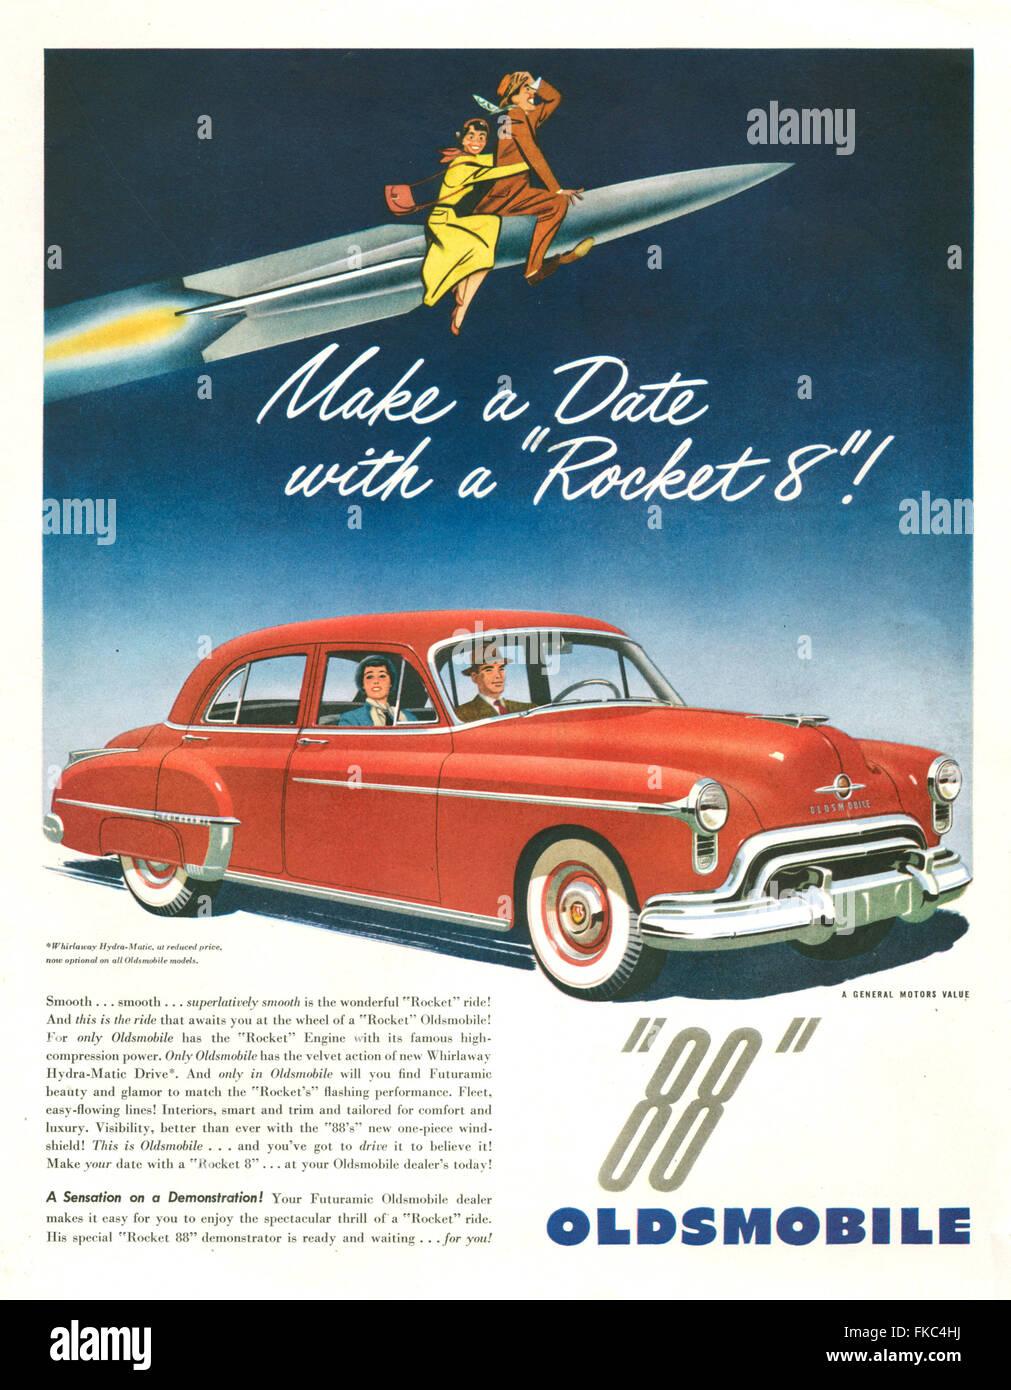 1950s Usa Oldsmobile Cars Magazine Stock Photos American Advert Image